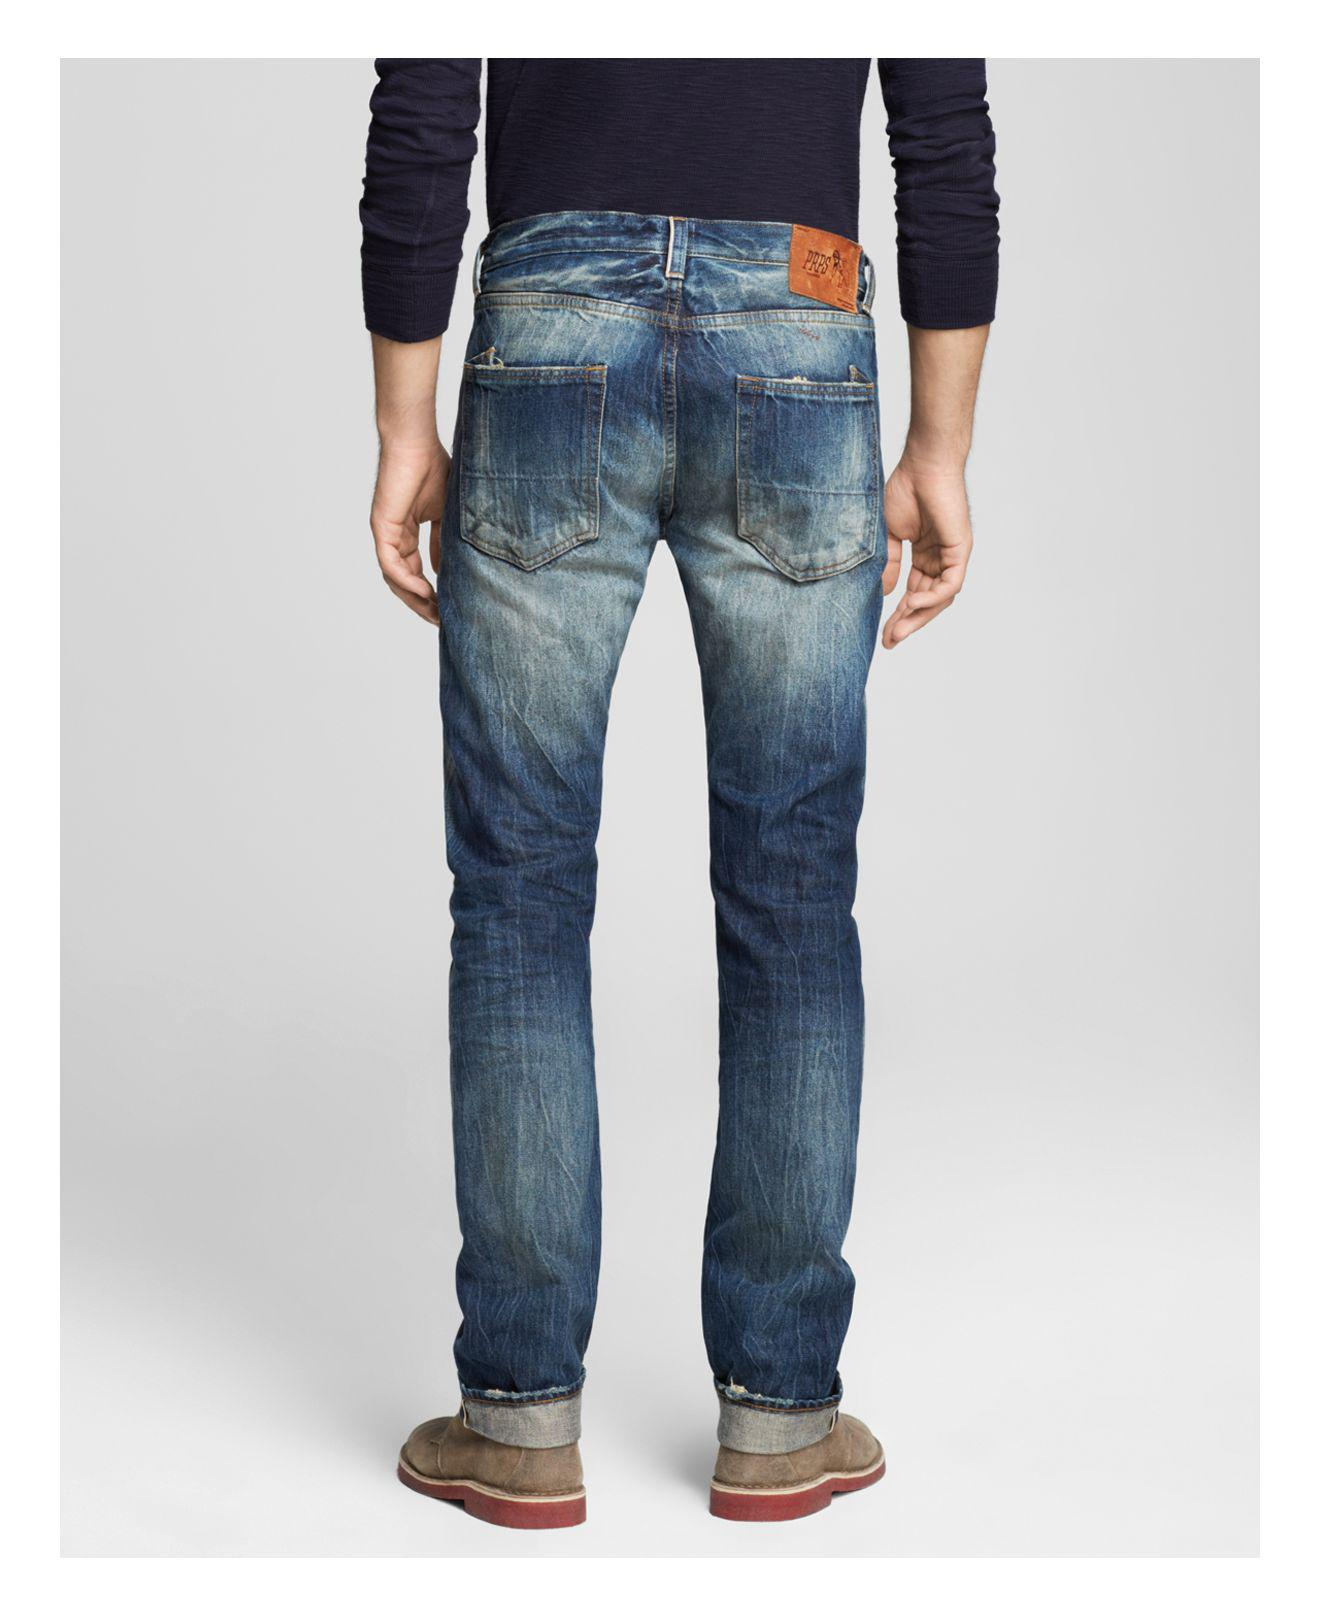 PRPS Denim Jeans - Demon Slim Fit In One Year Wash in Blue for Men